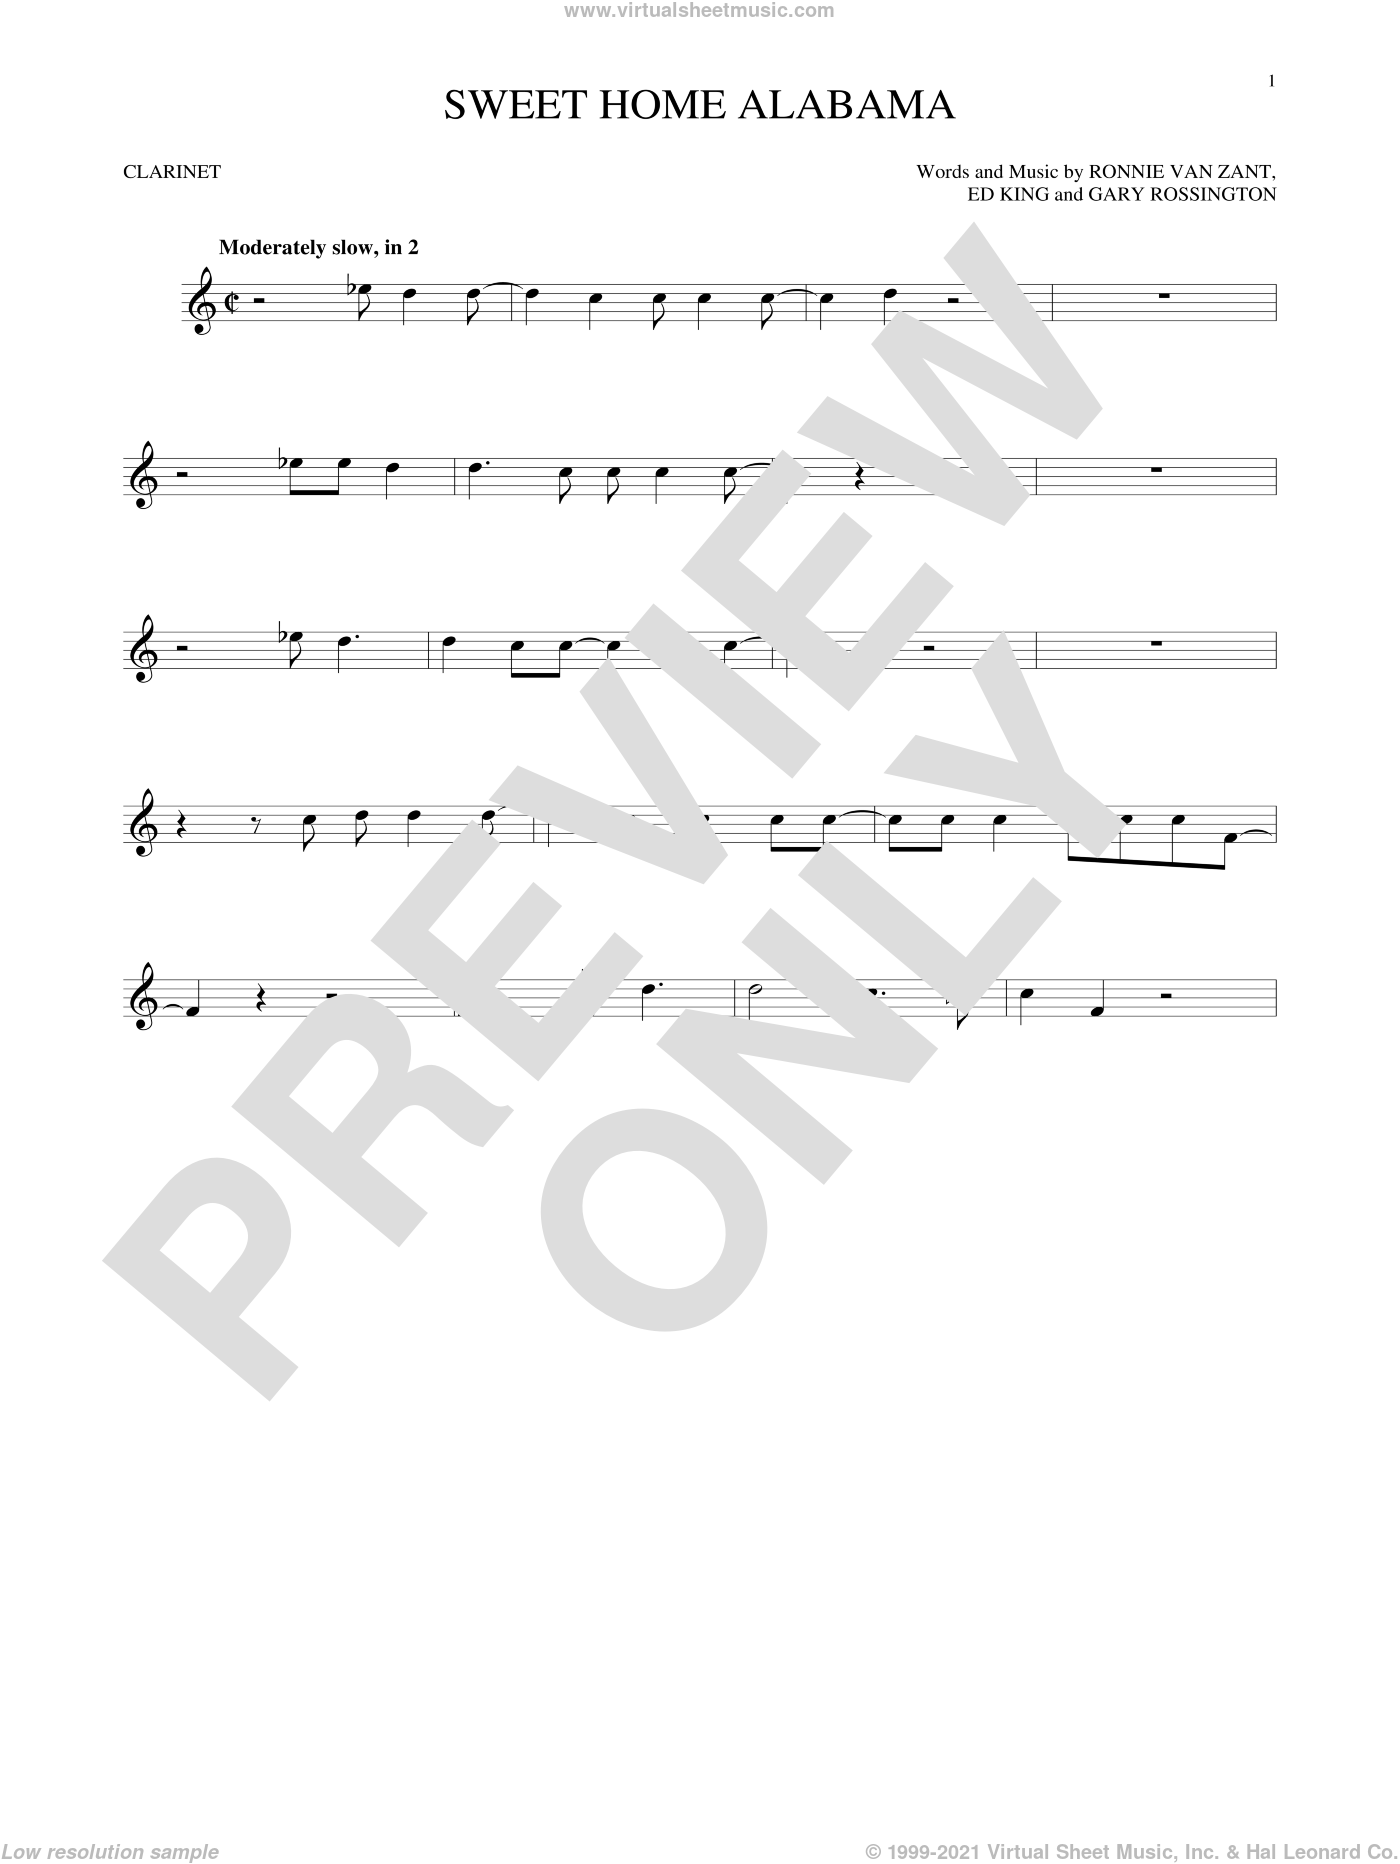 Sweet Home Alabama sheet music for clarinet solo by Lynyrd Skynyrd, Alabama, Edward King, Gary Rossington and Ronnie Van Zant, intermediate skill level